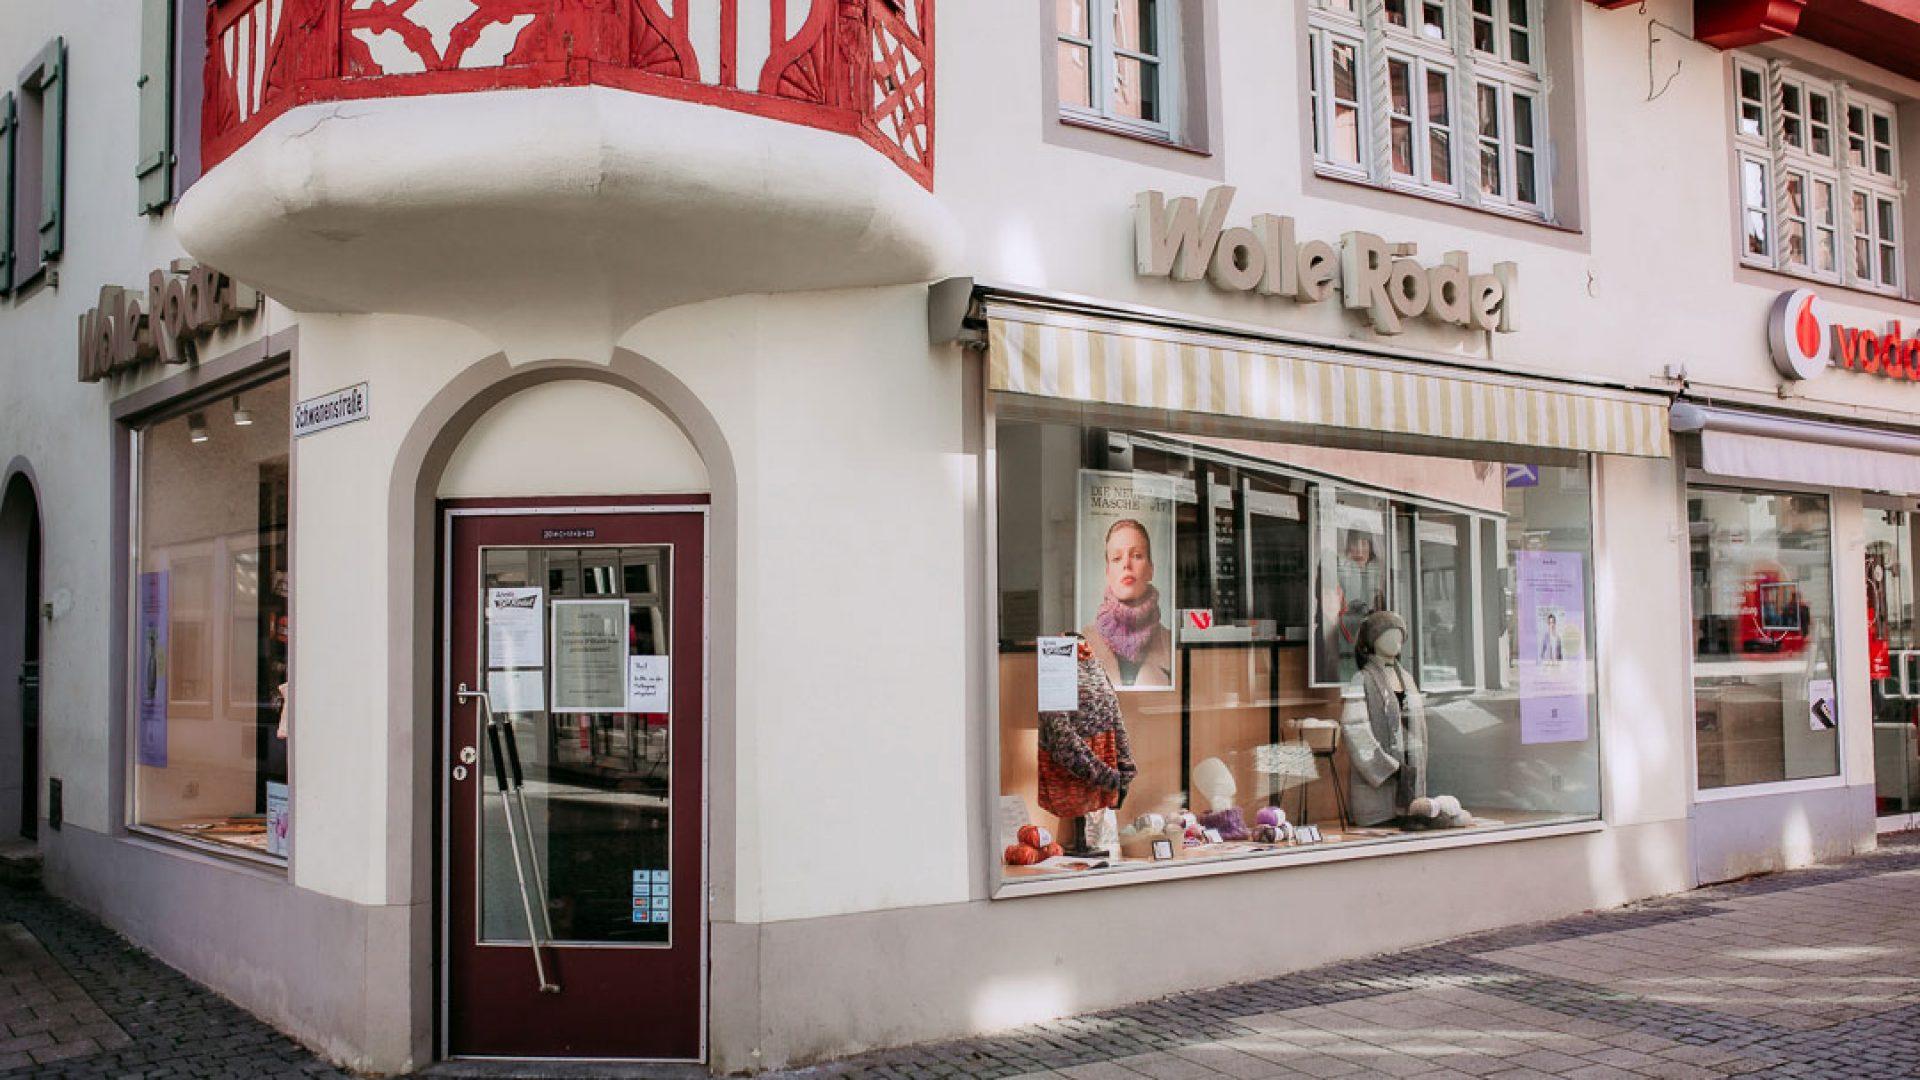 Einkaufen-in-Ansbach-Wolle-Roedel